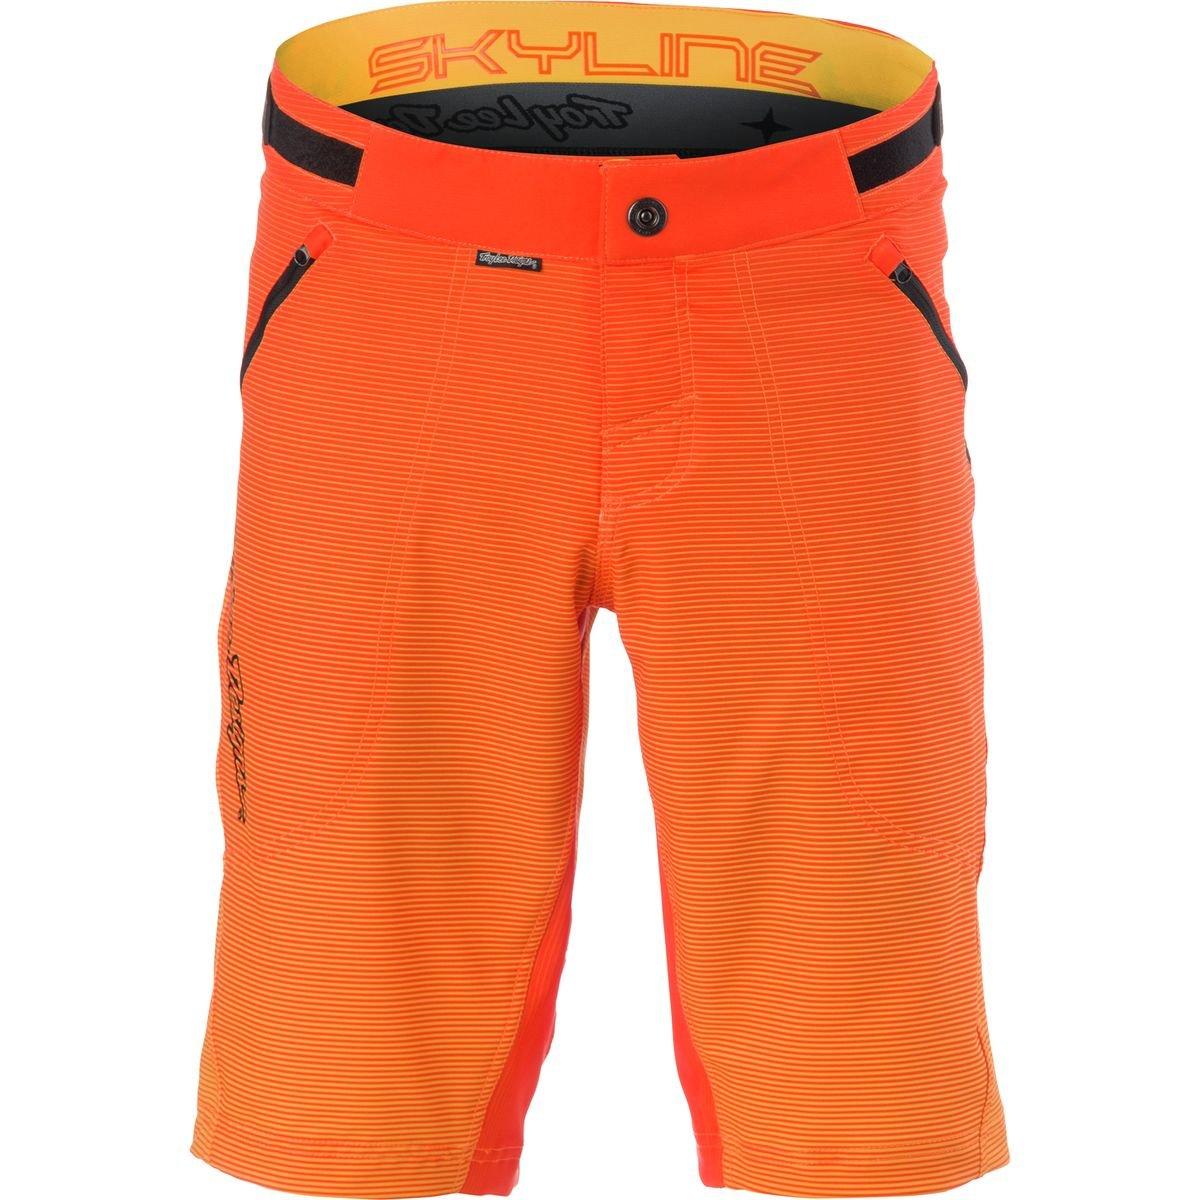 Troy Lee Designs Skyline Dissolve Men's BMX Bicycle Shorts - Orange